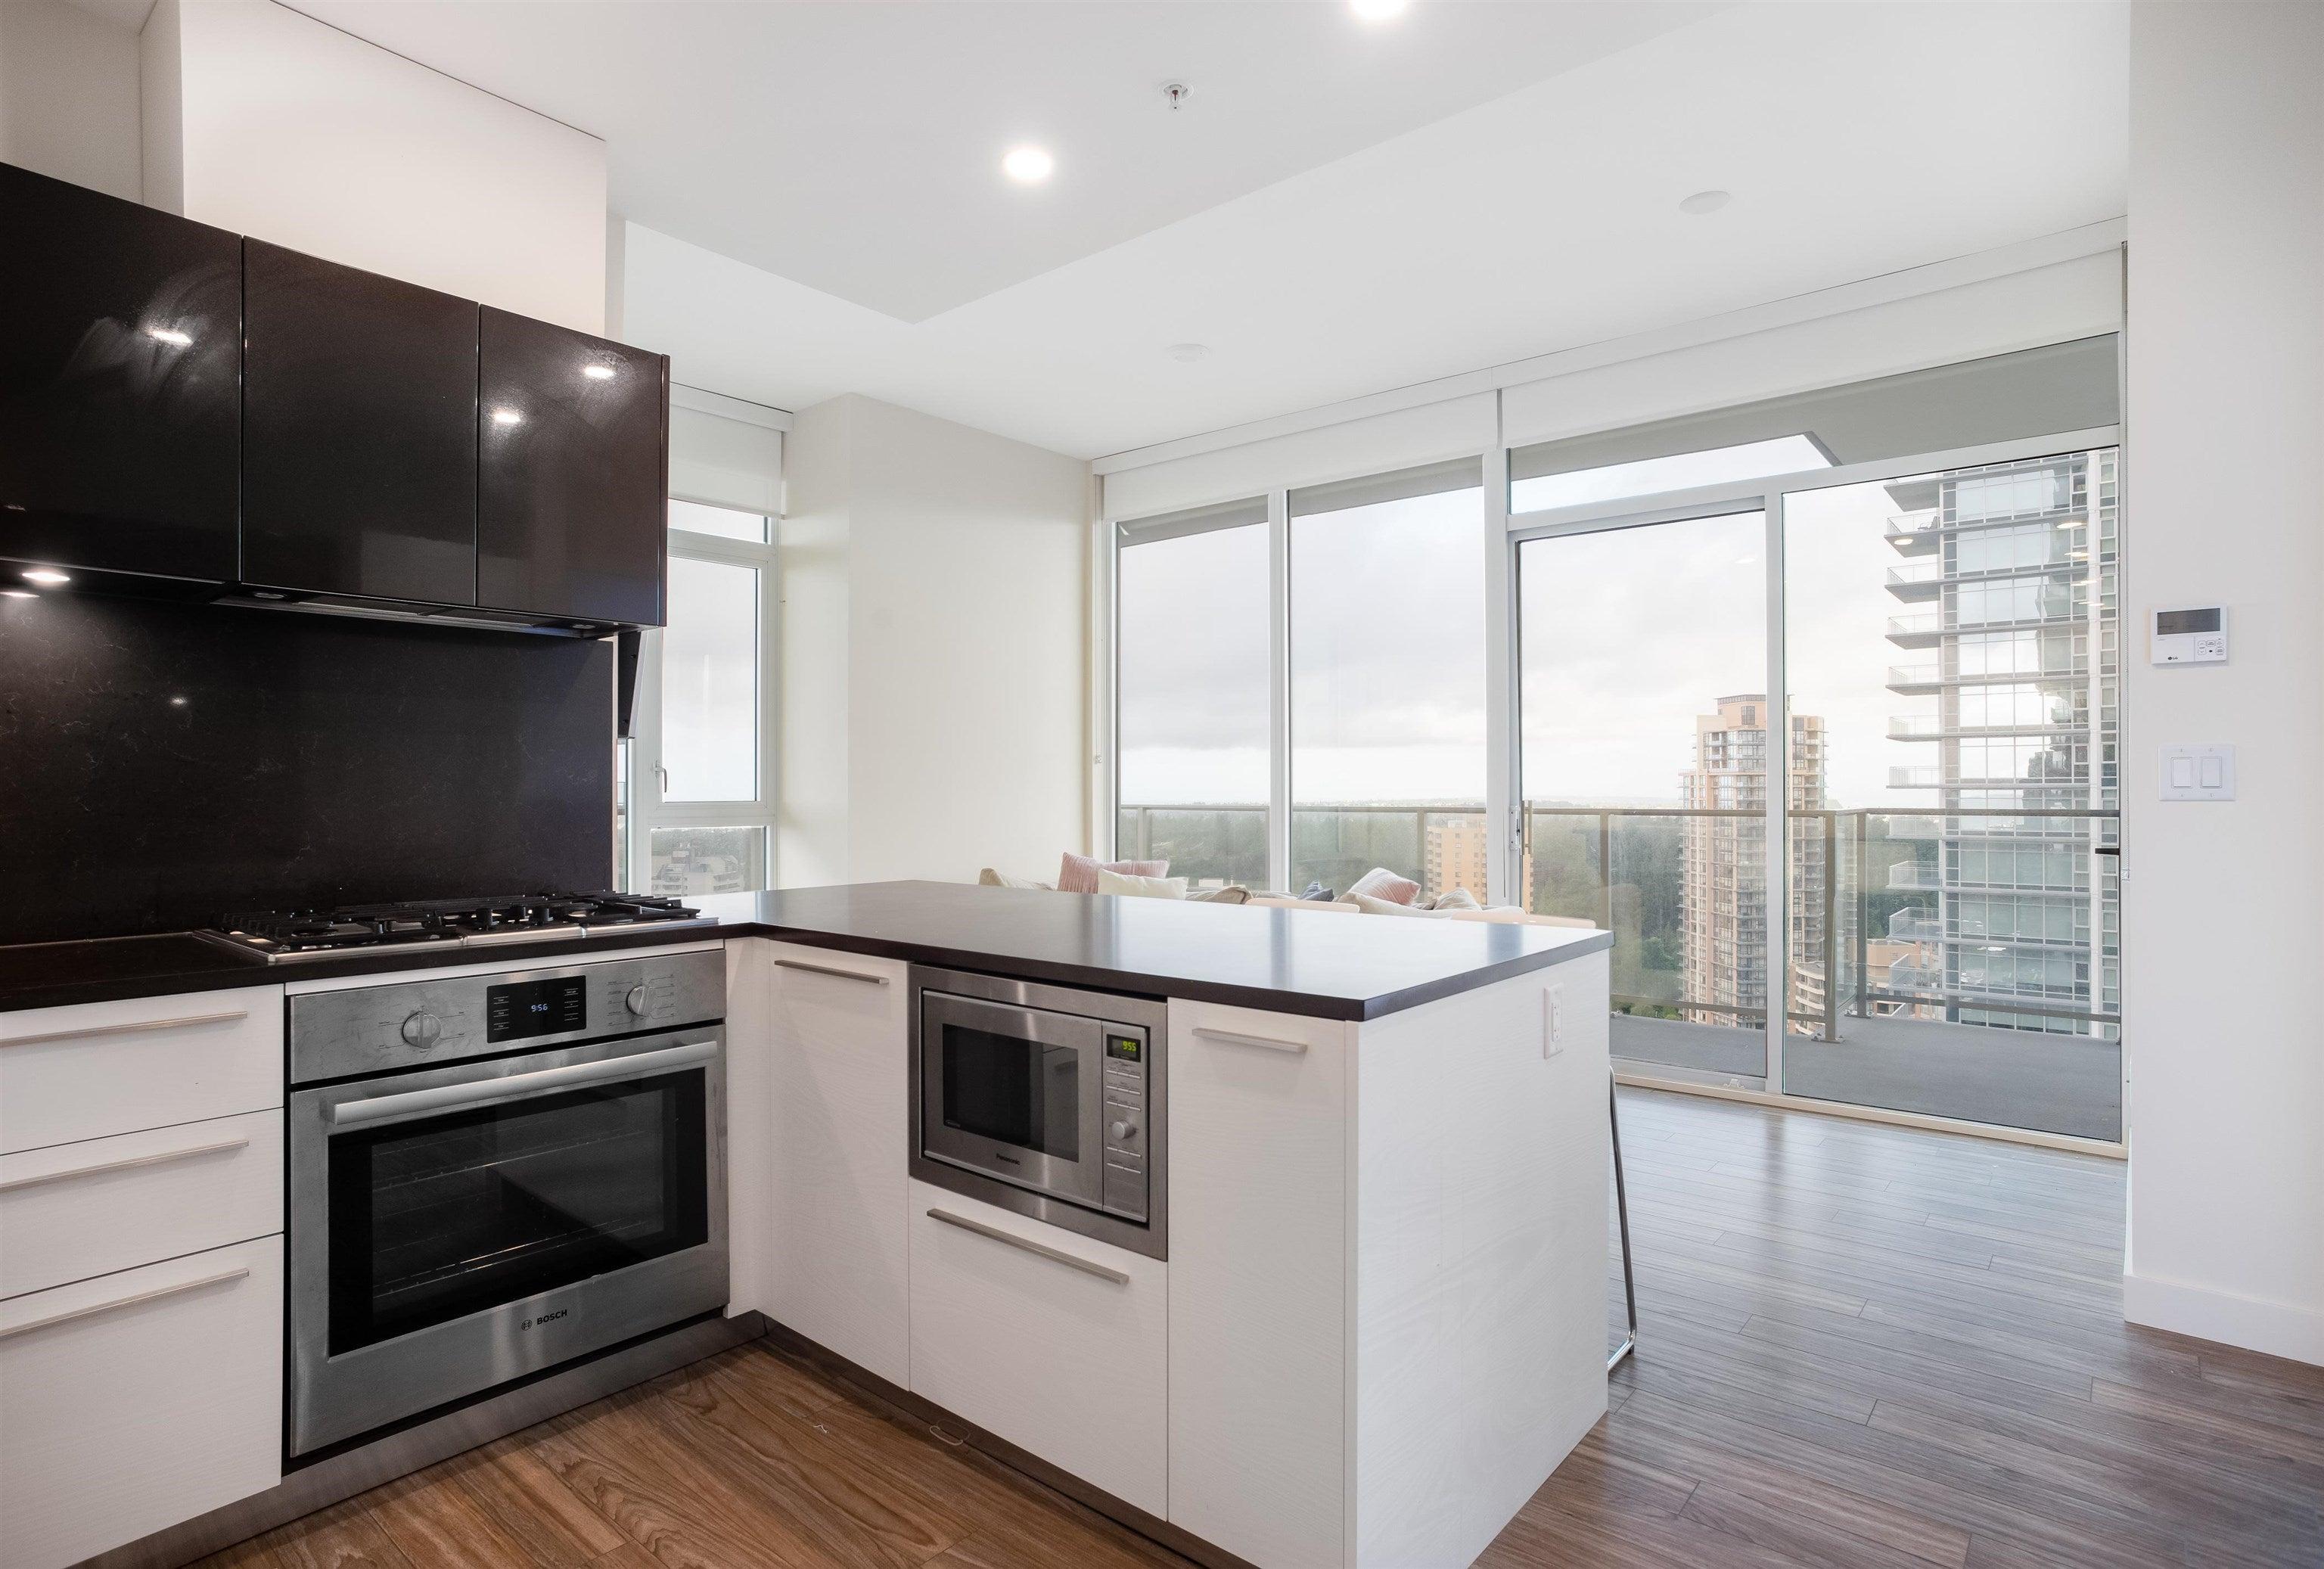 2206 6383 MCKAY AVENUE - Metrotown Apartment/Condo for sale, 2 Bedrooms (R2625647) - #11